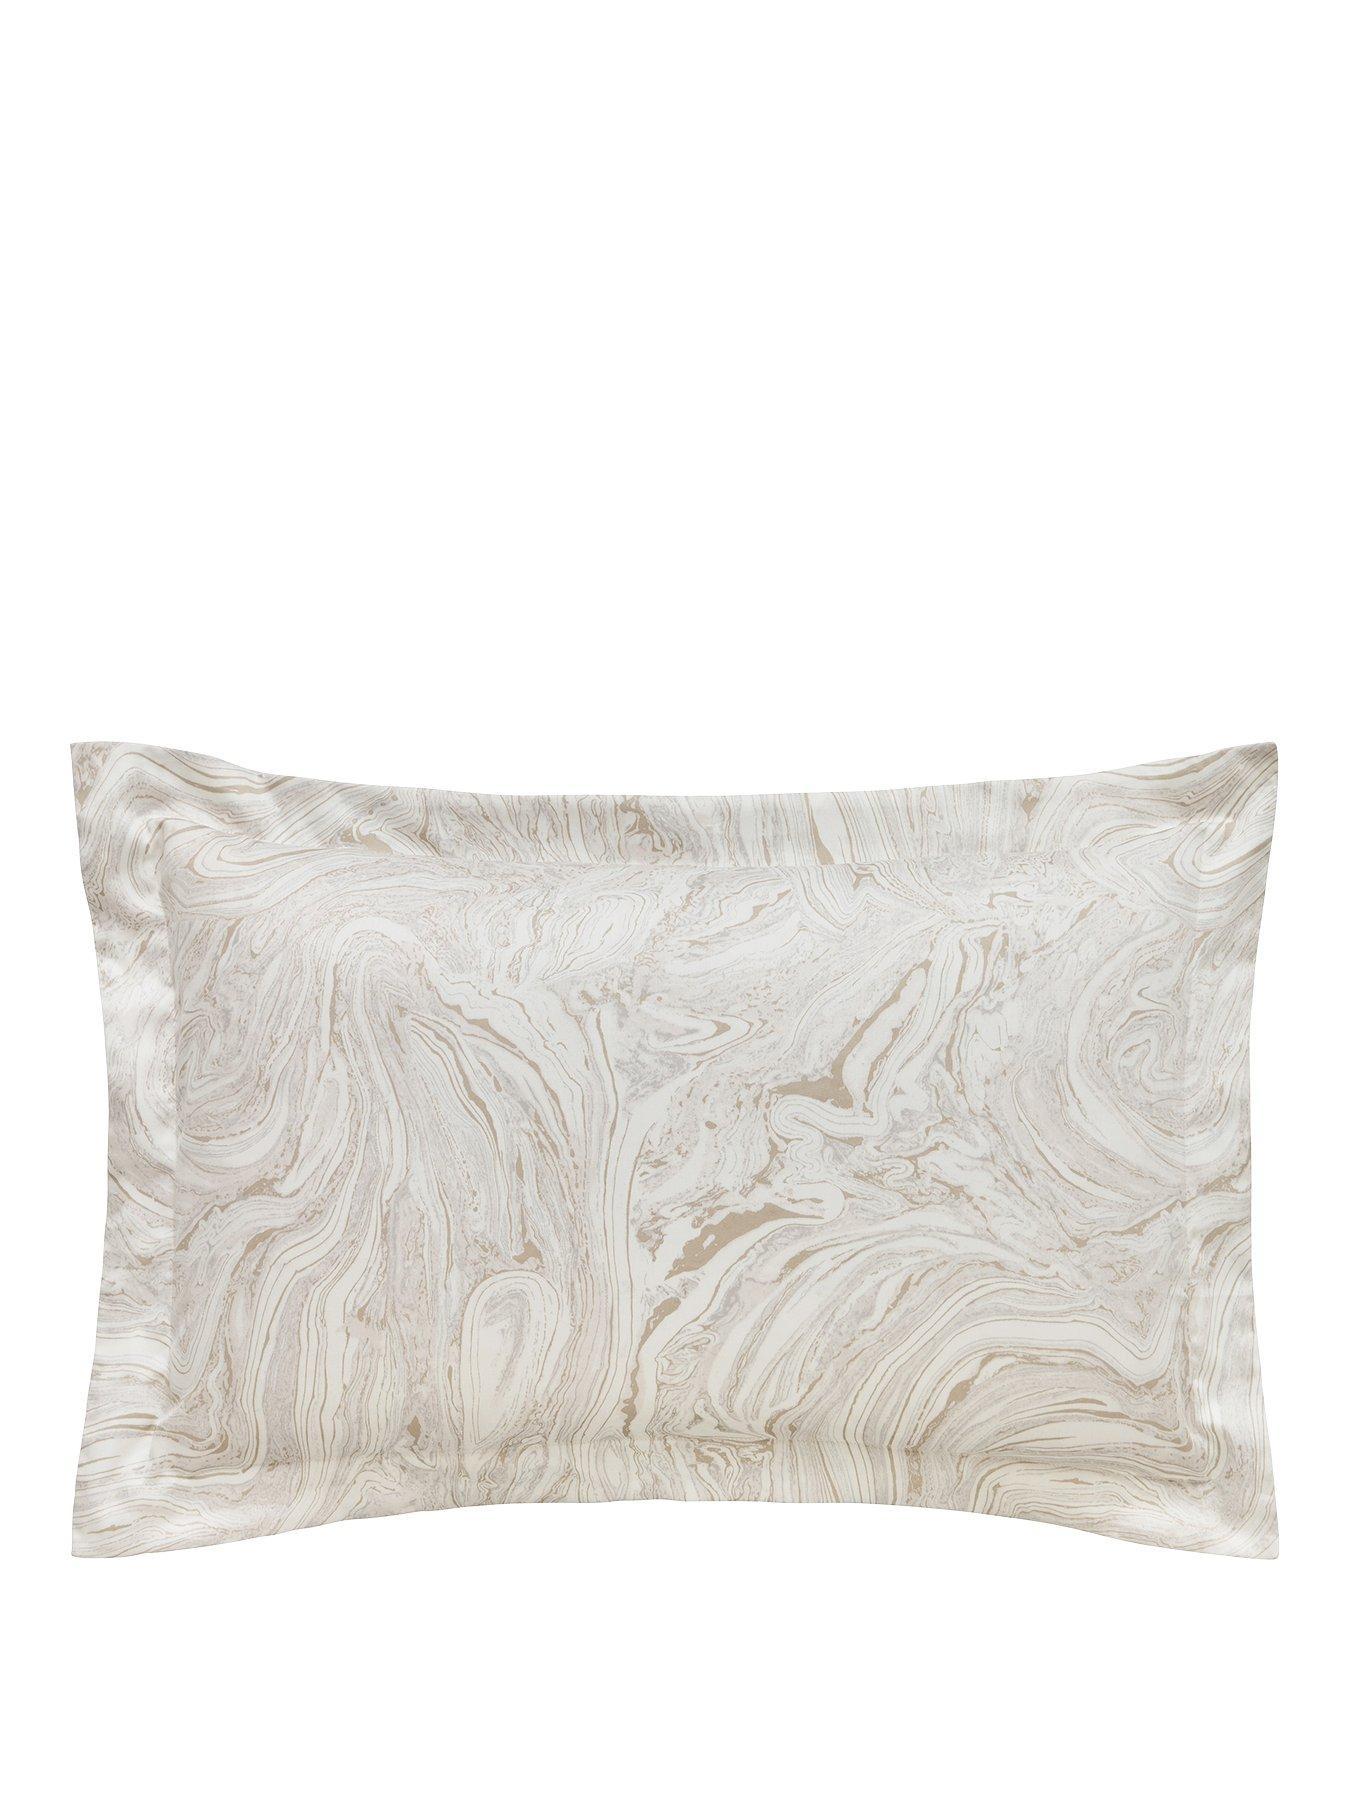 Harlequin Makrana Oxford Pillowcase